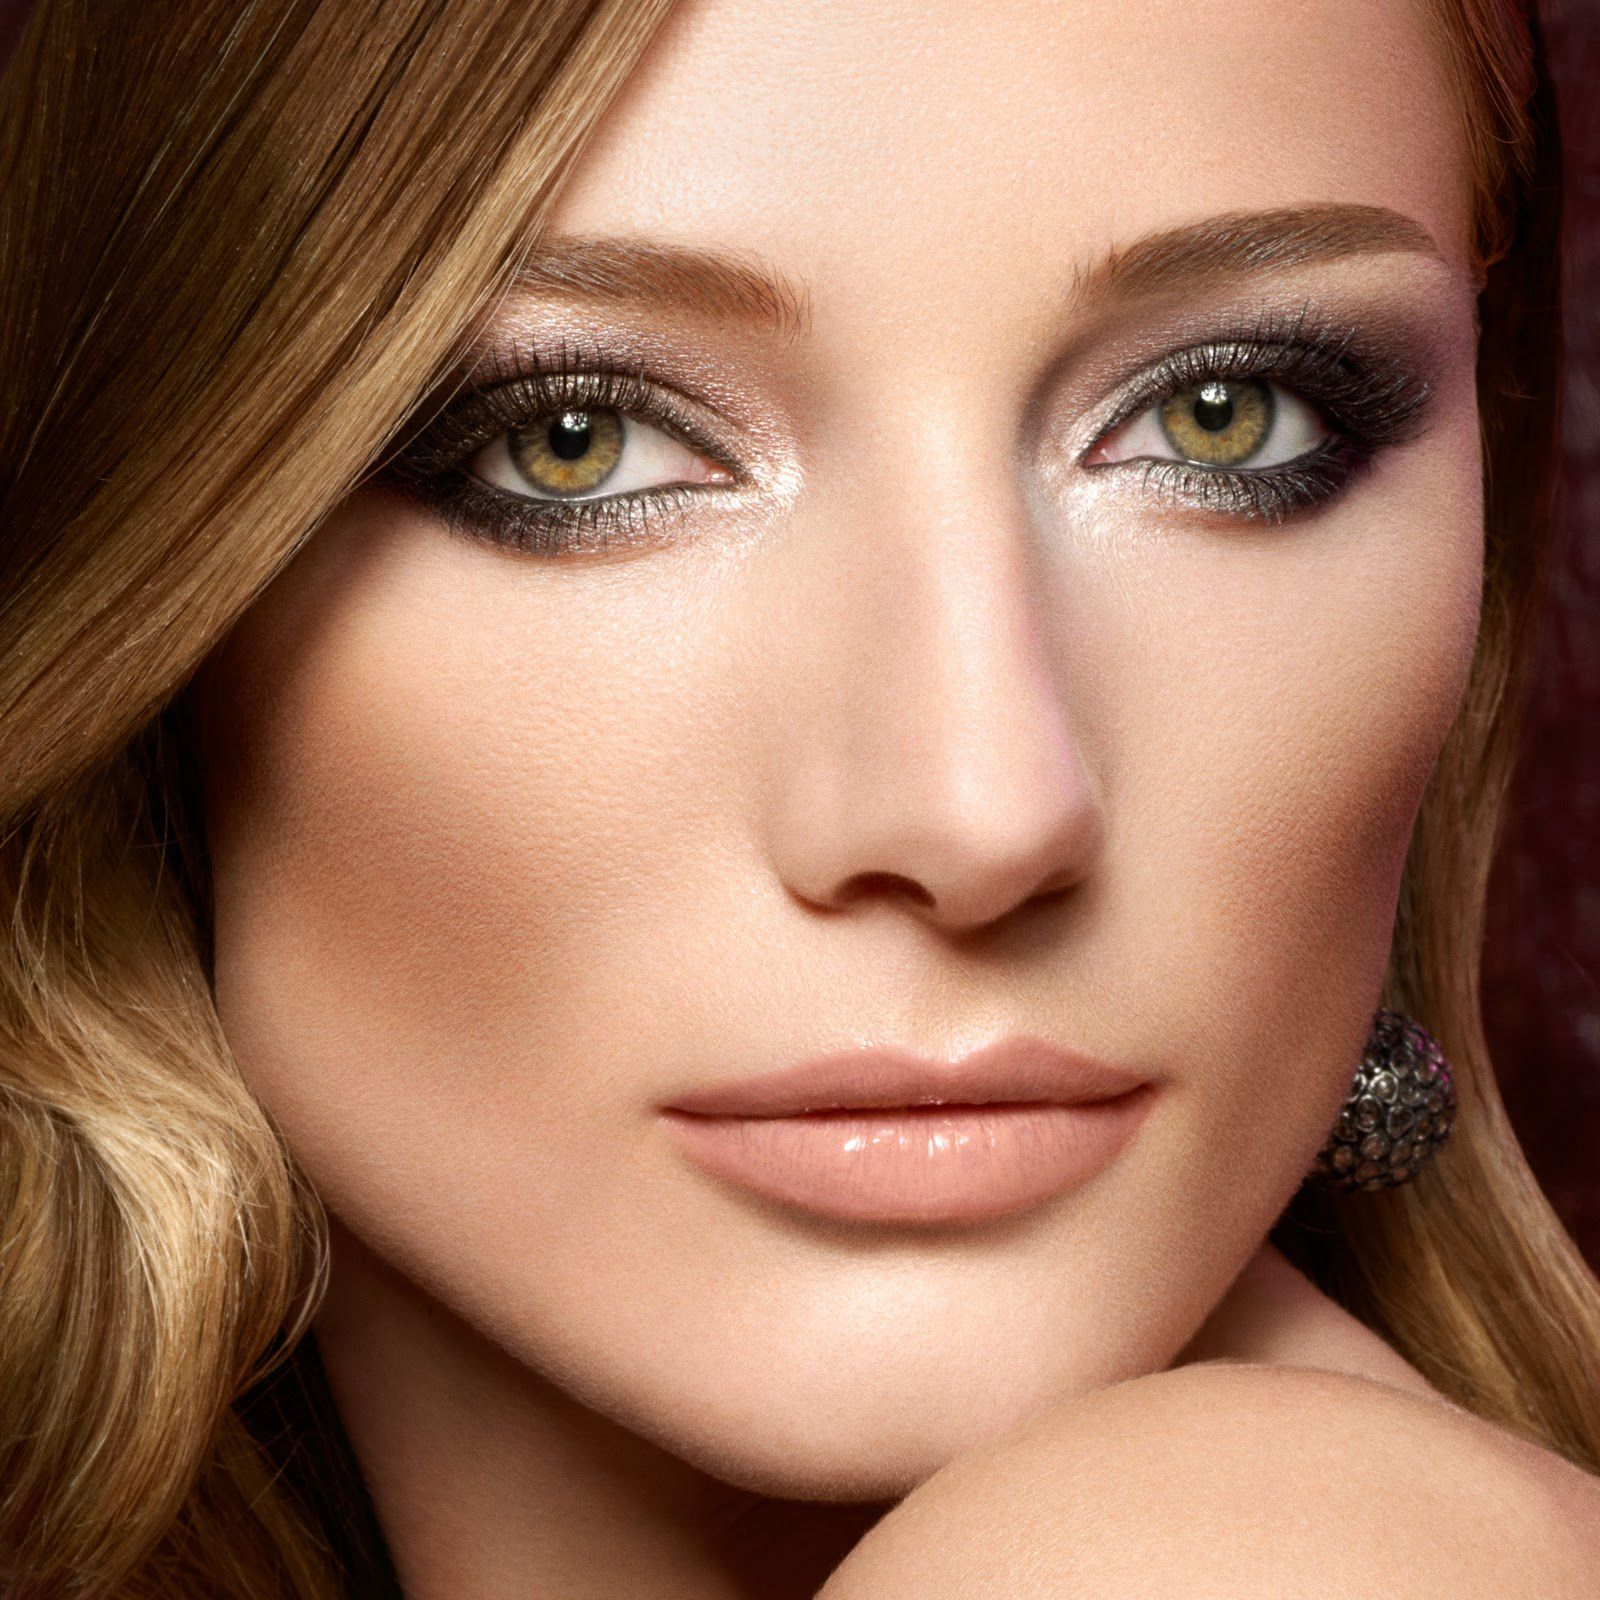 stunning makeup tips for colored eyes | makeup for hazel